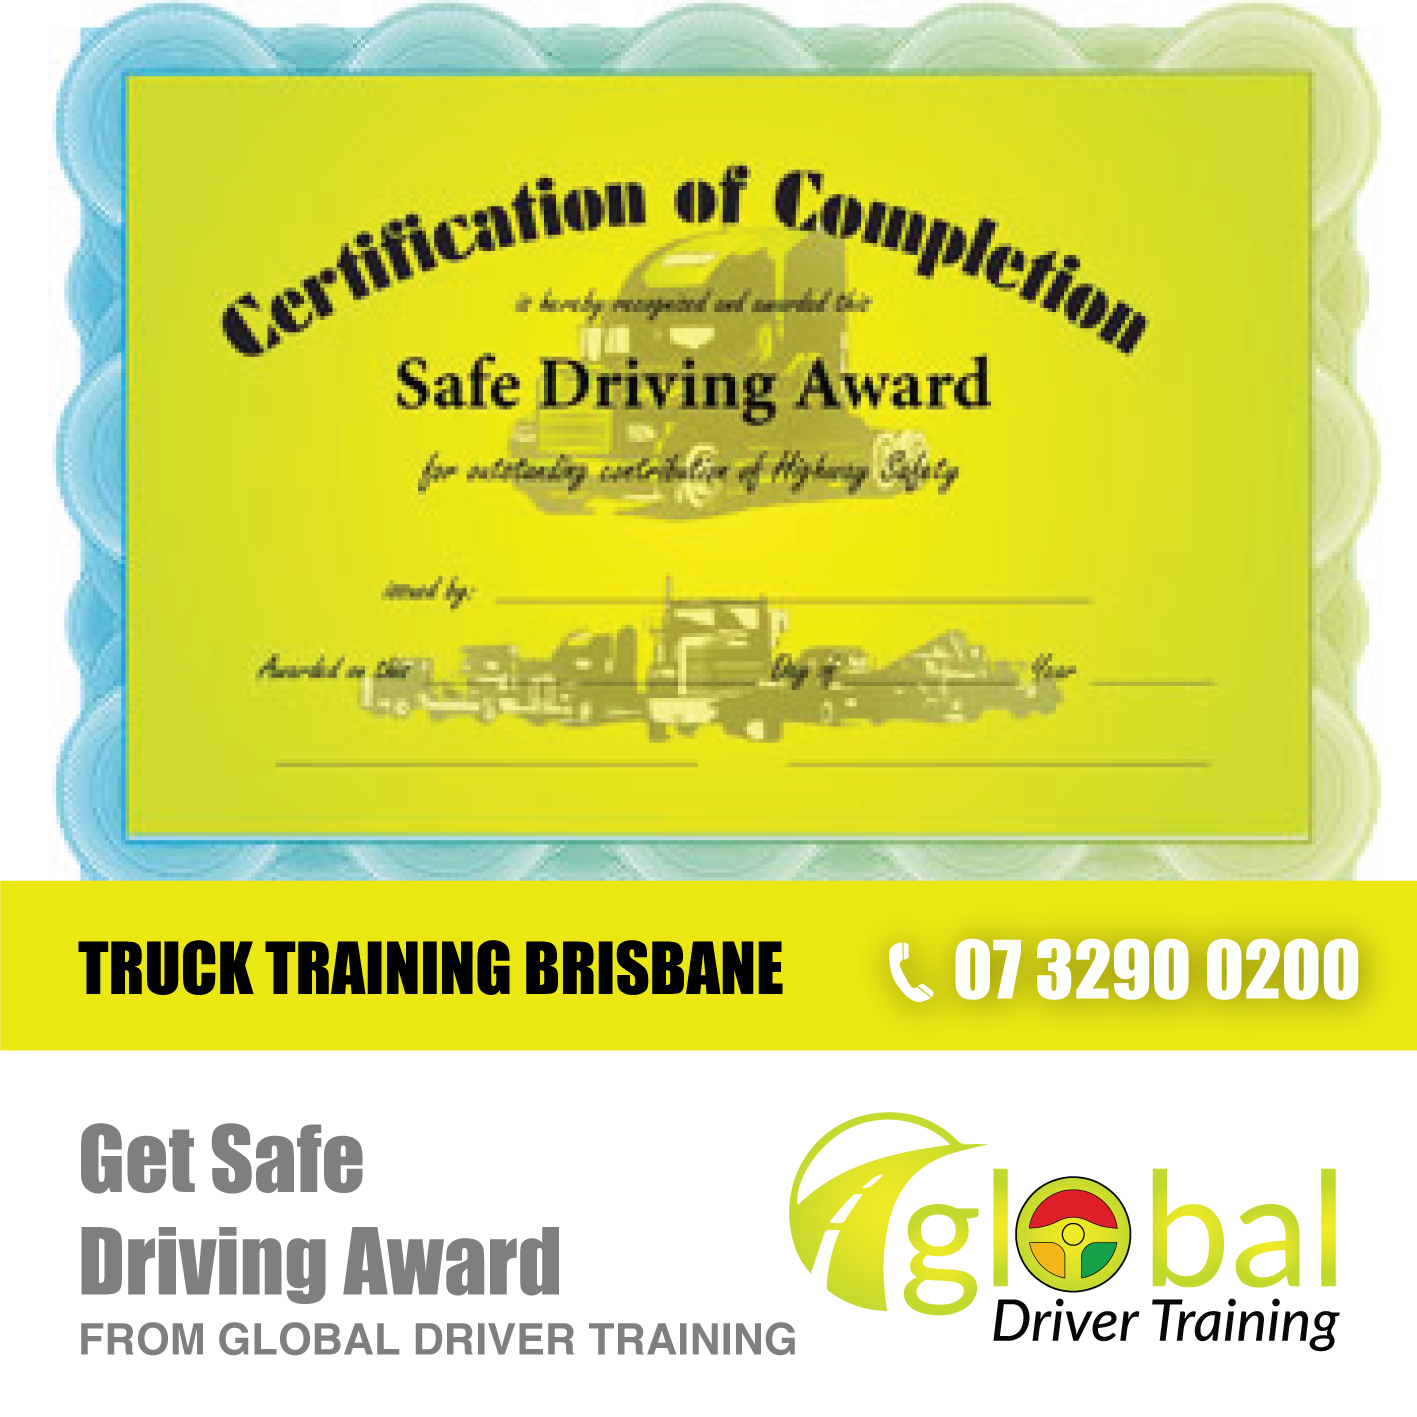 Get Safe Driving Award! We currently offer Certificate II